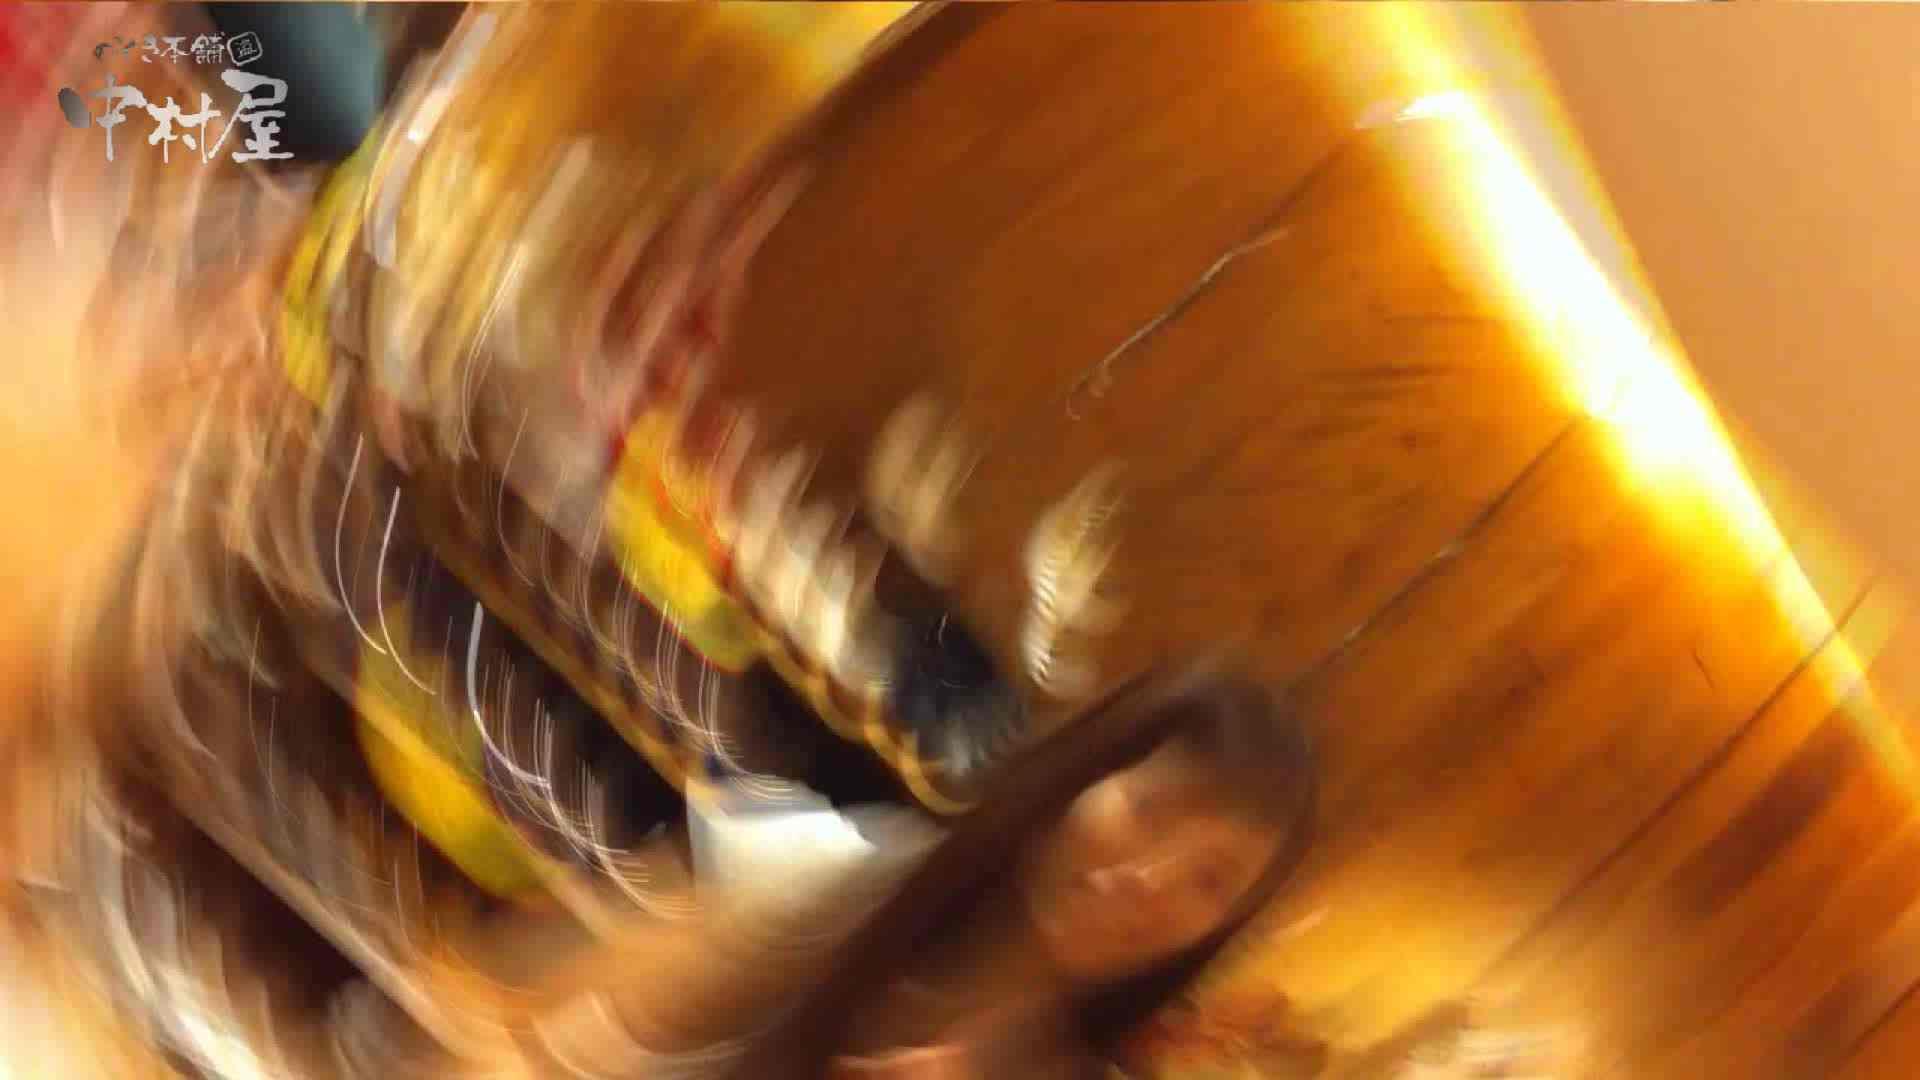 vol.81 美人アパレル胸チラ&パンチラ 食い込みショッピング チラ歓迎  78pic 40